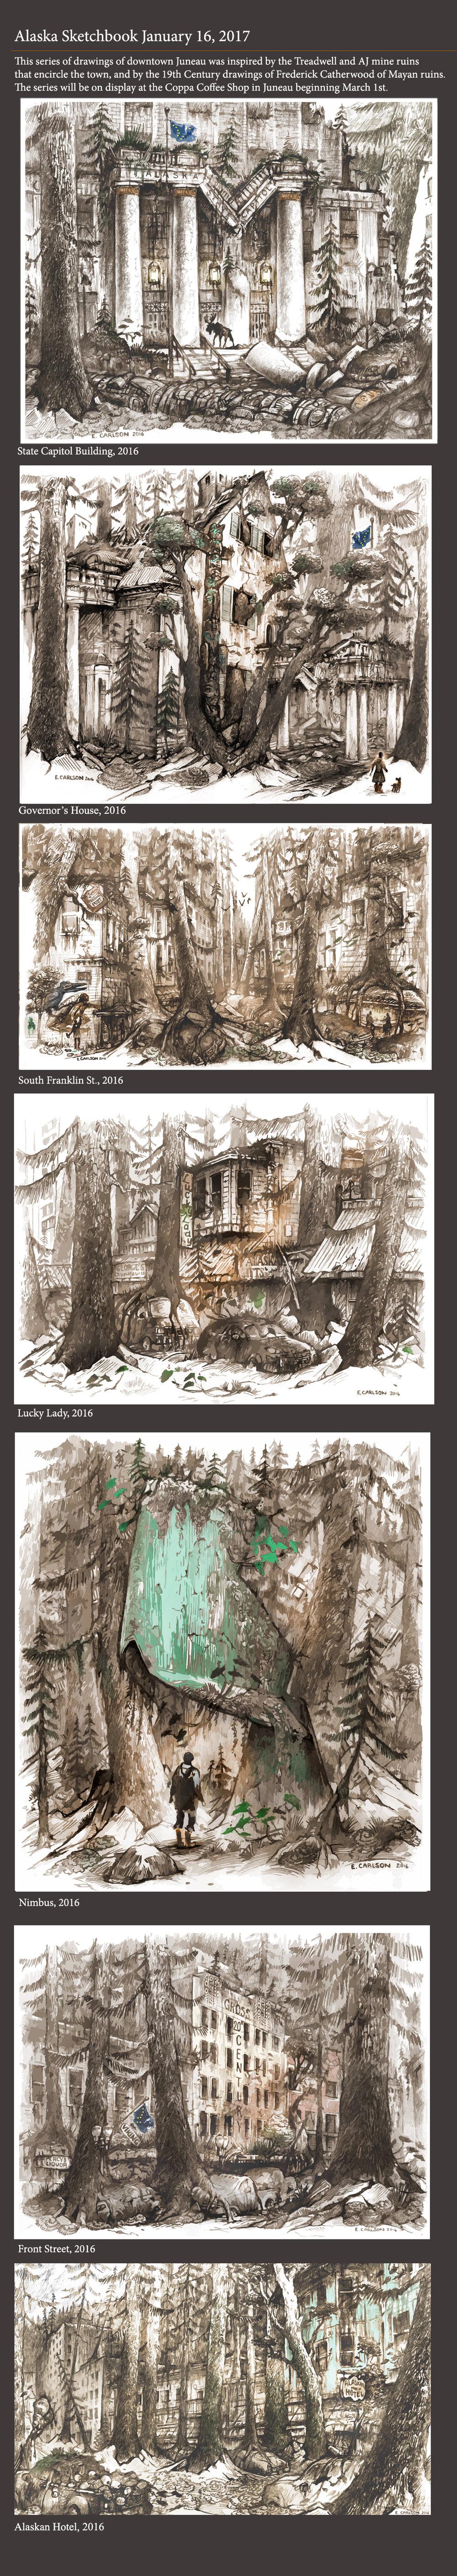 Alaska Sketchbook_2017